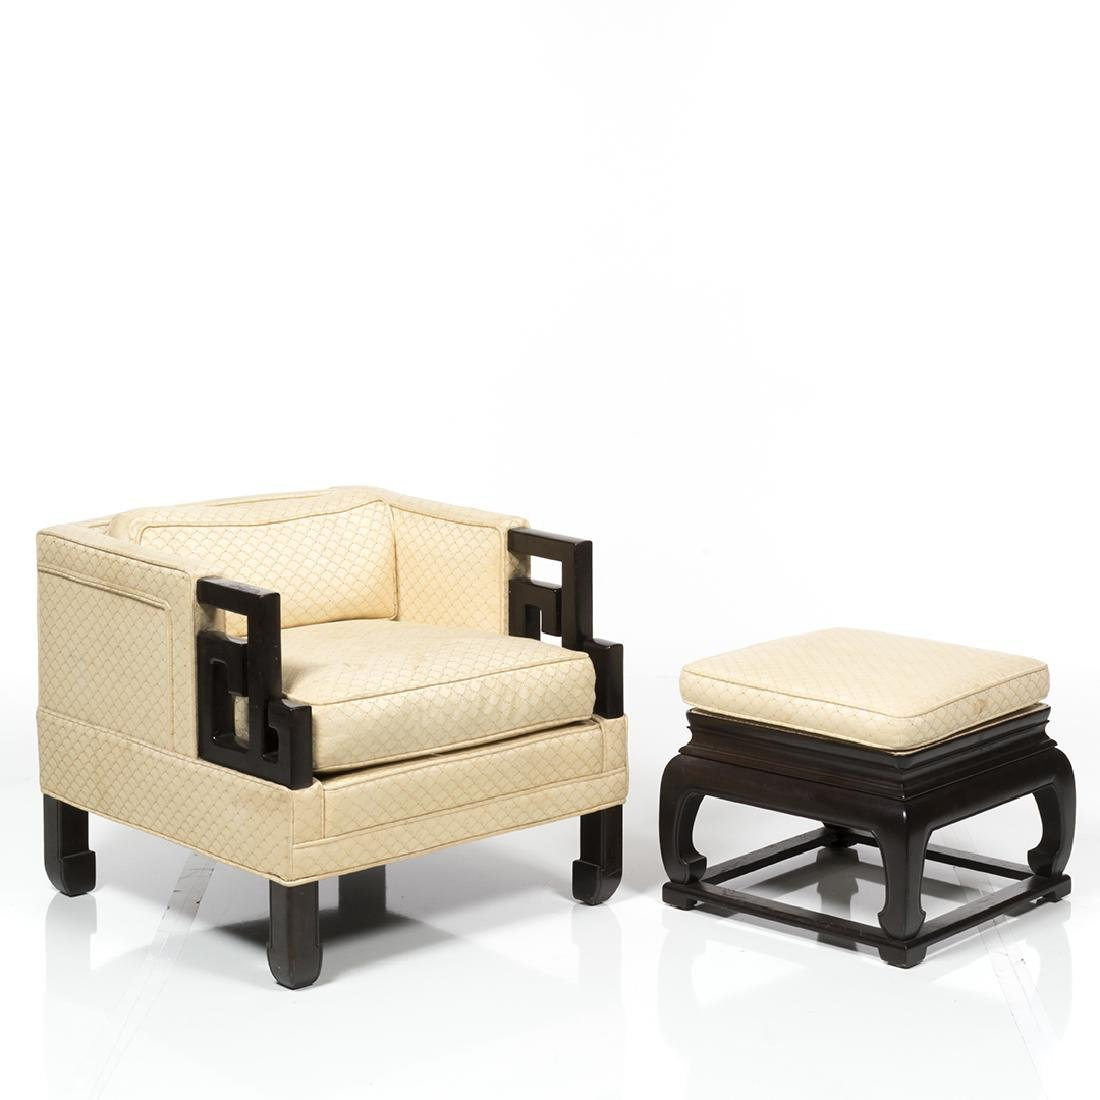 Michael Taylor Far East Chair and Ottoman